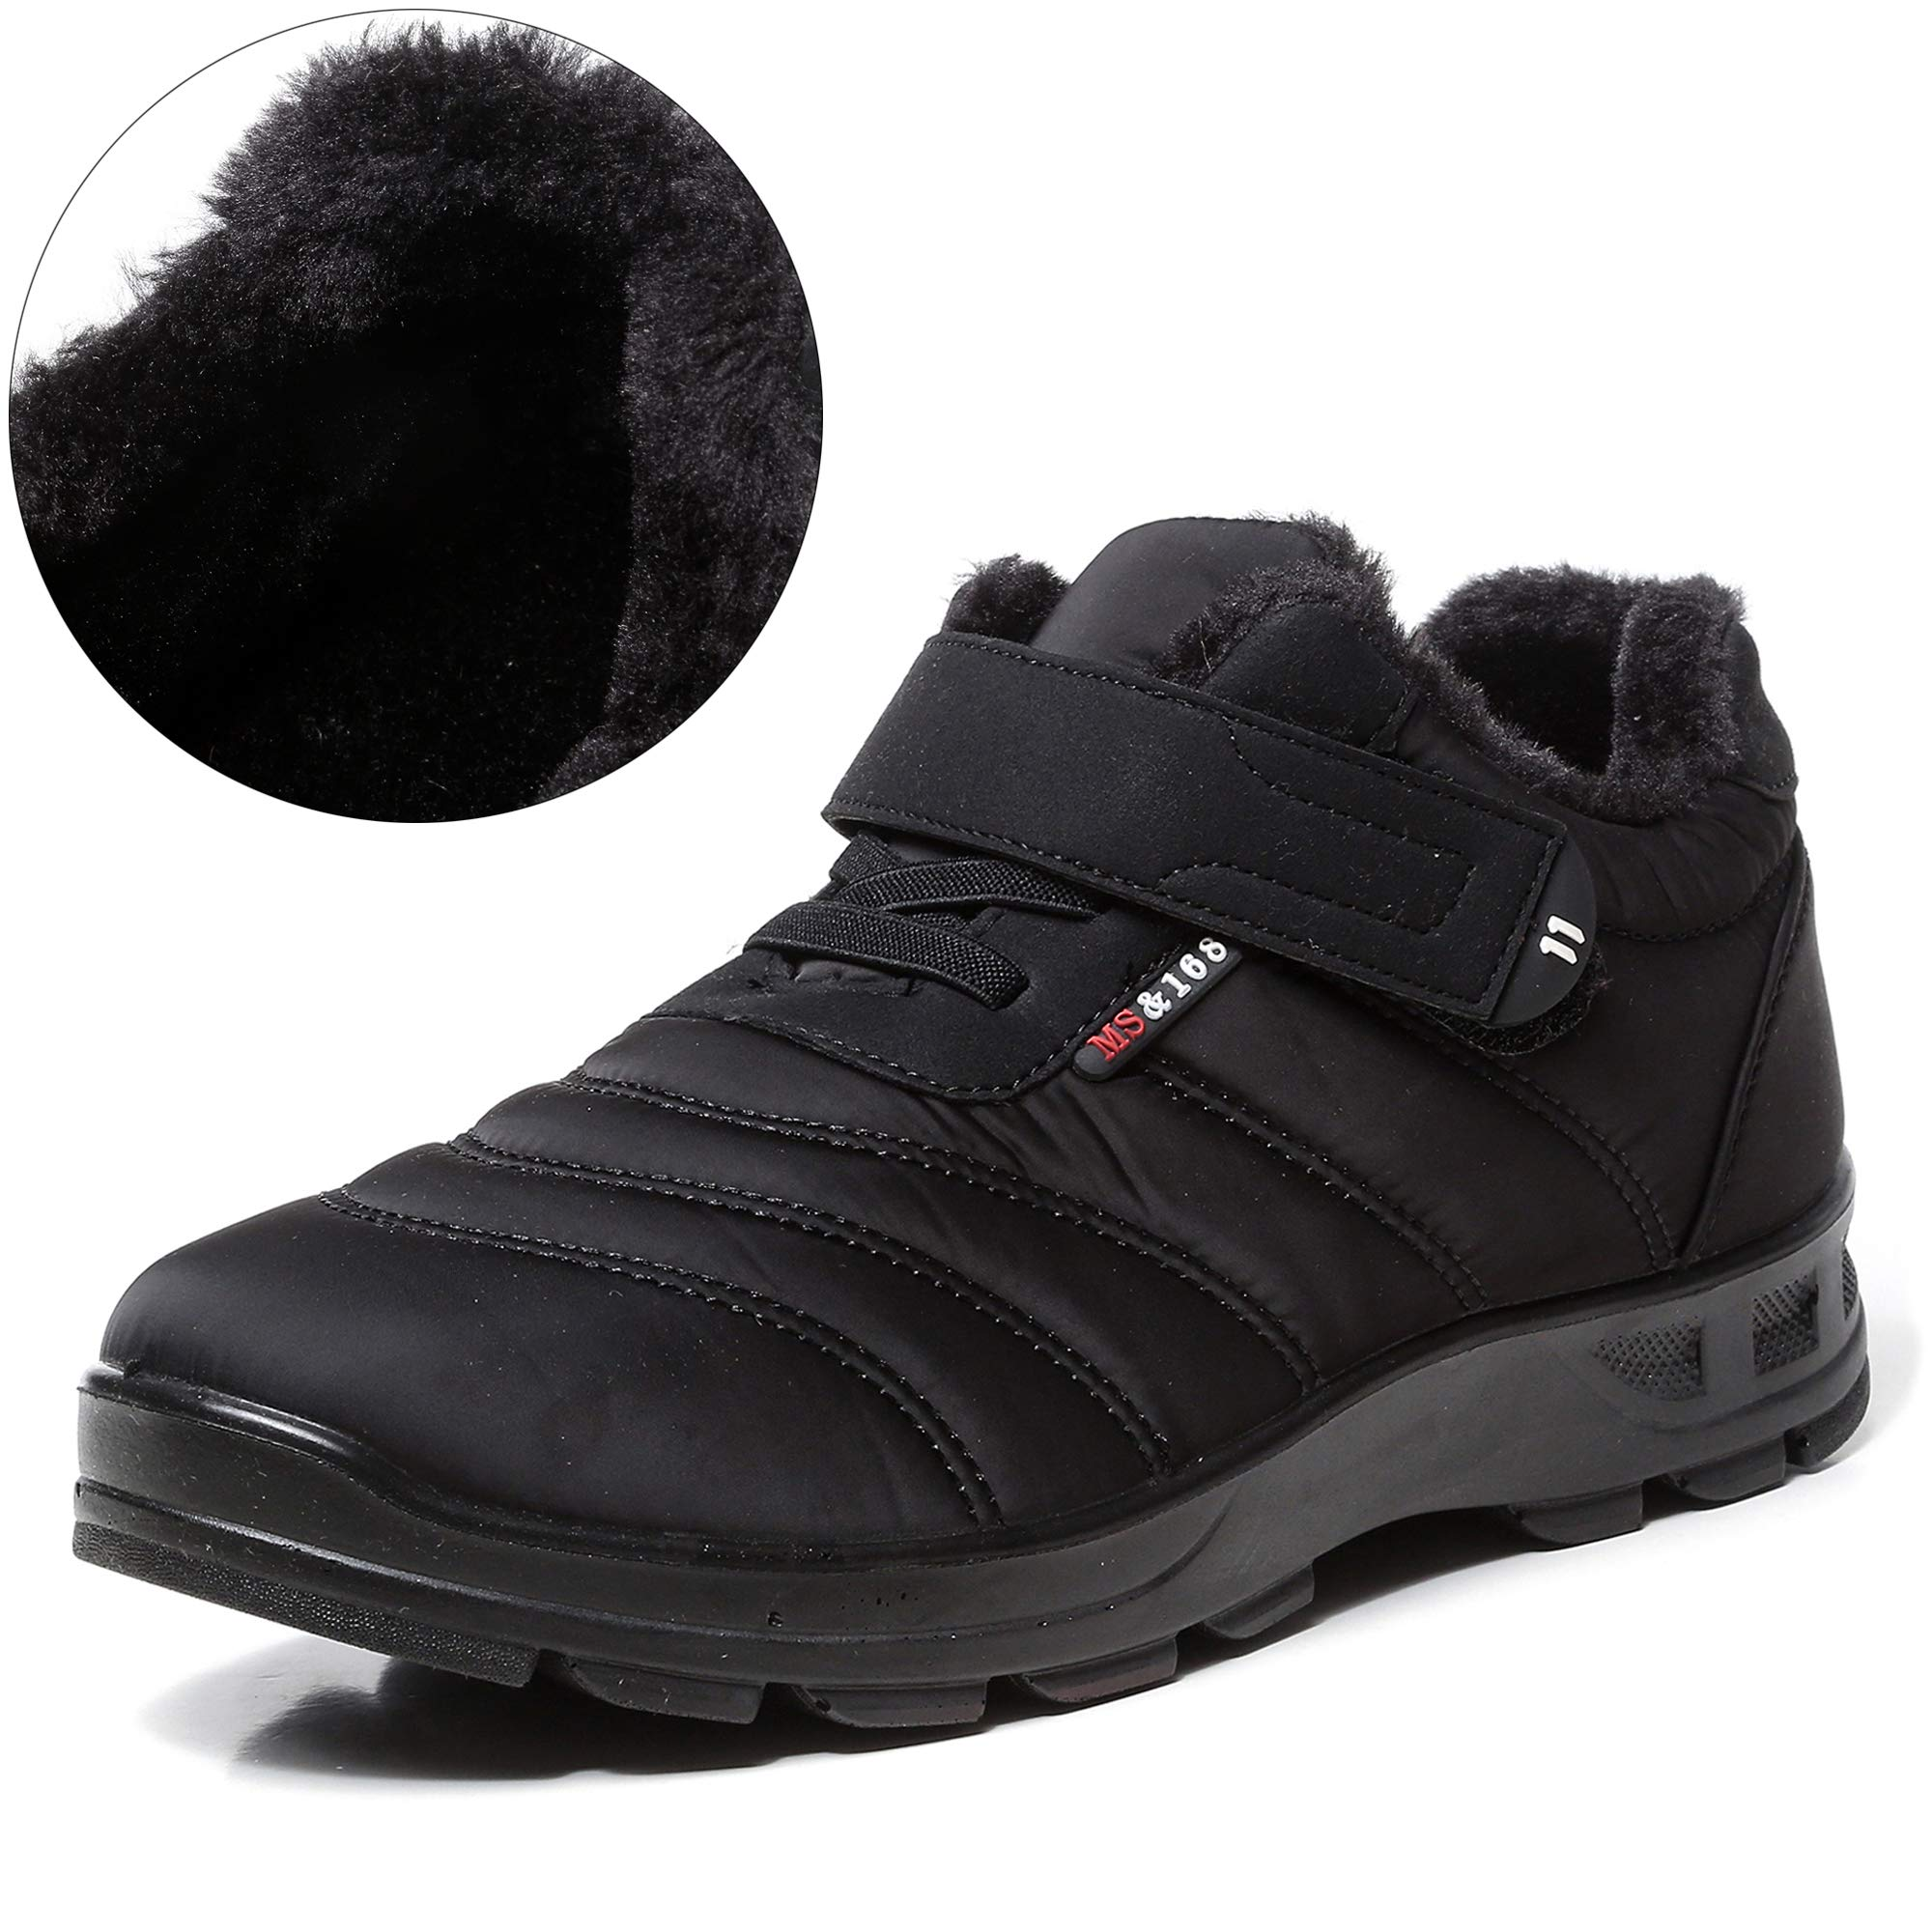 SCIEN Women's Snow Boots Waterproof Anti-Slip Winter Shoes Outdoor Warm Fur Lined Ankle Sneakers, Black 39